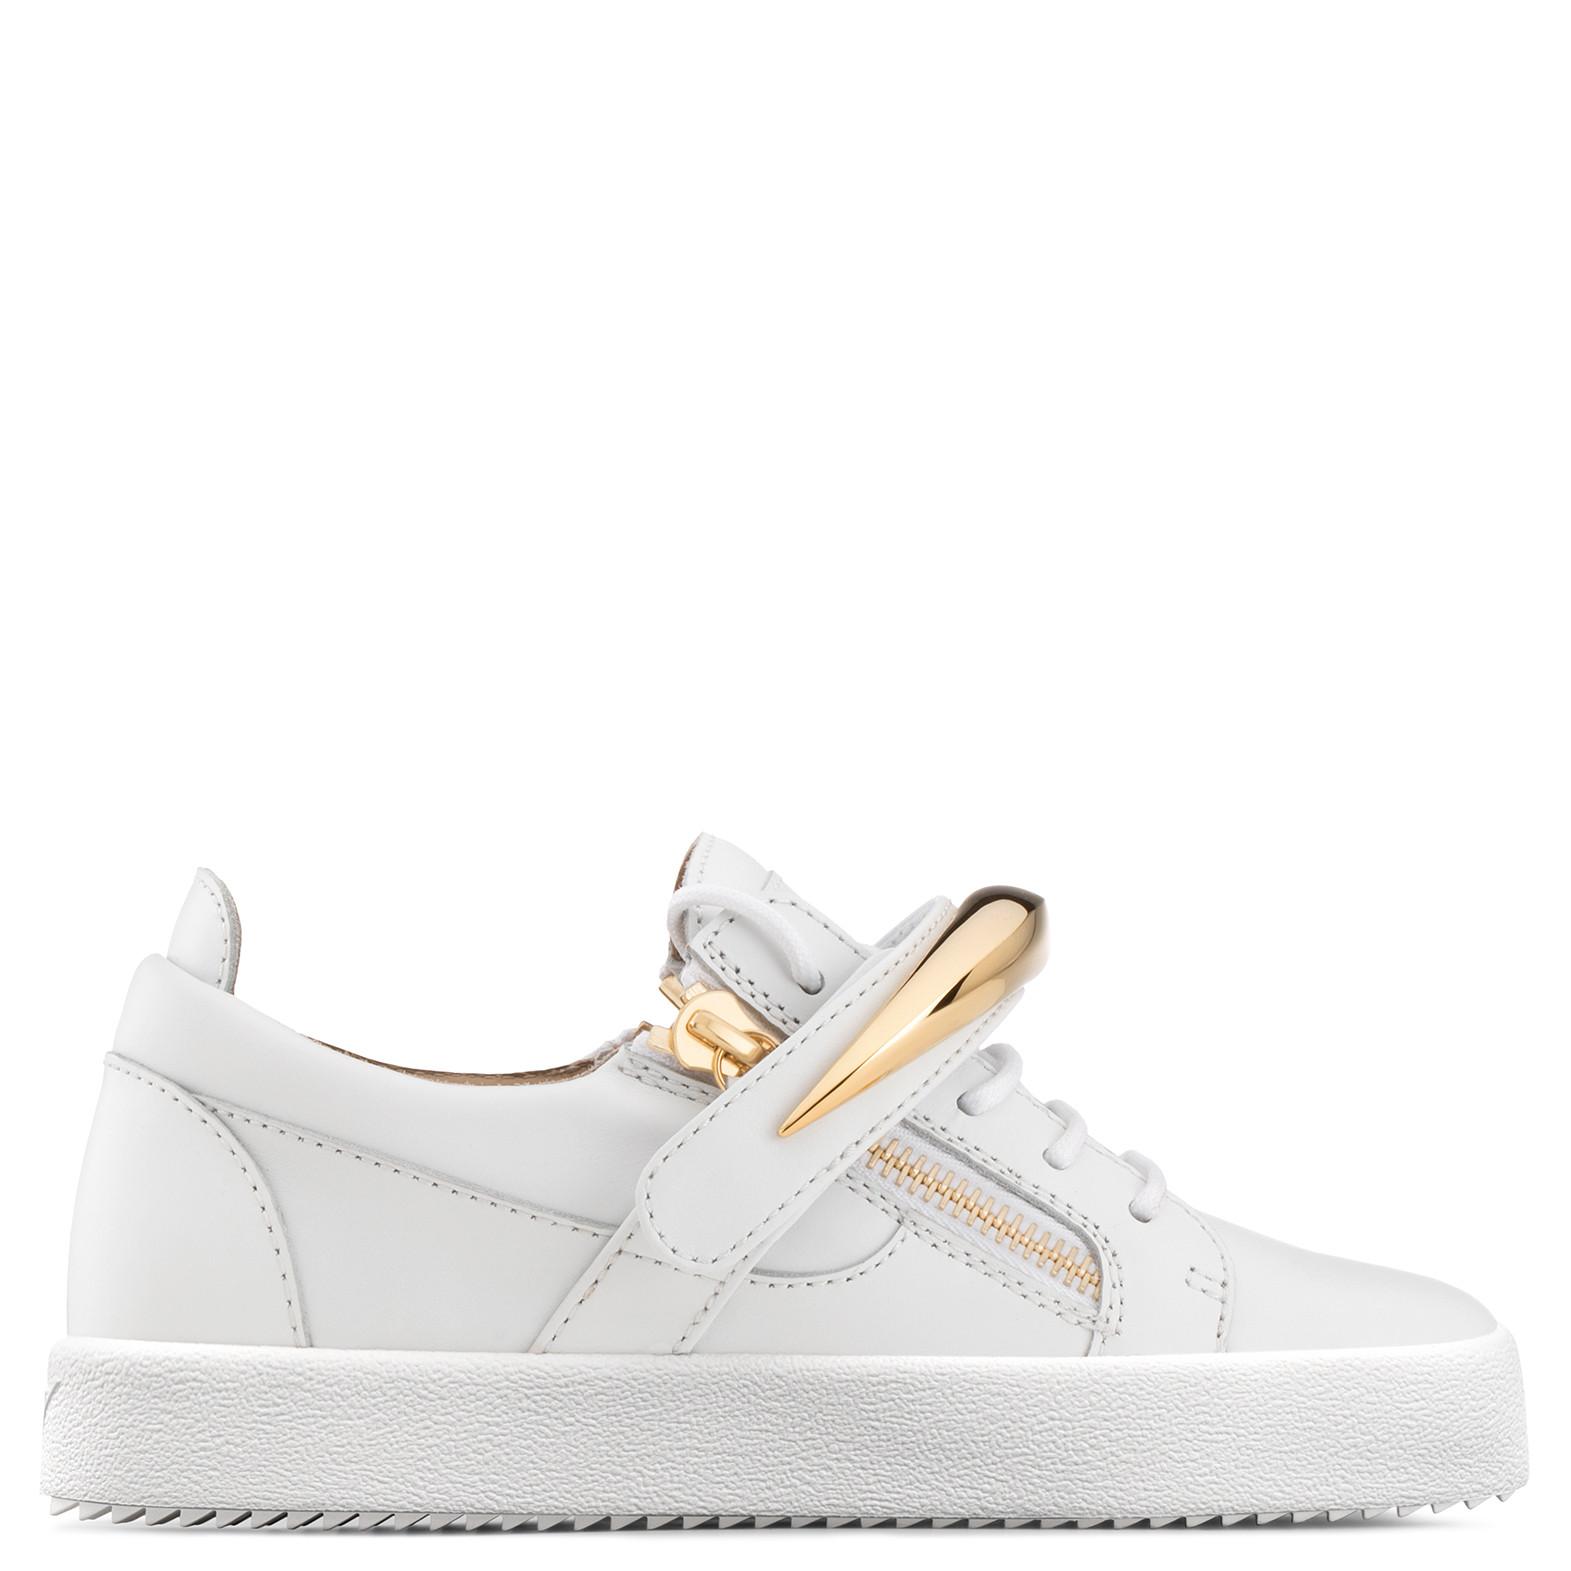 Giuseppe Zanotti - White Calfskin Low-top Sneaker With Gold Accessory Randall